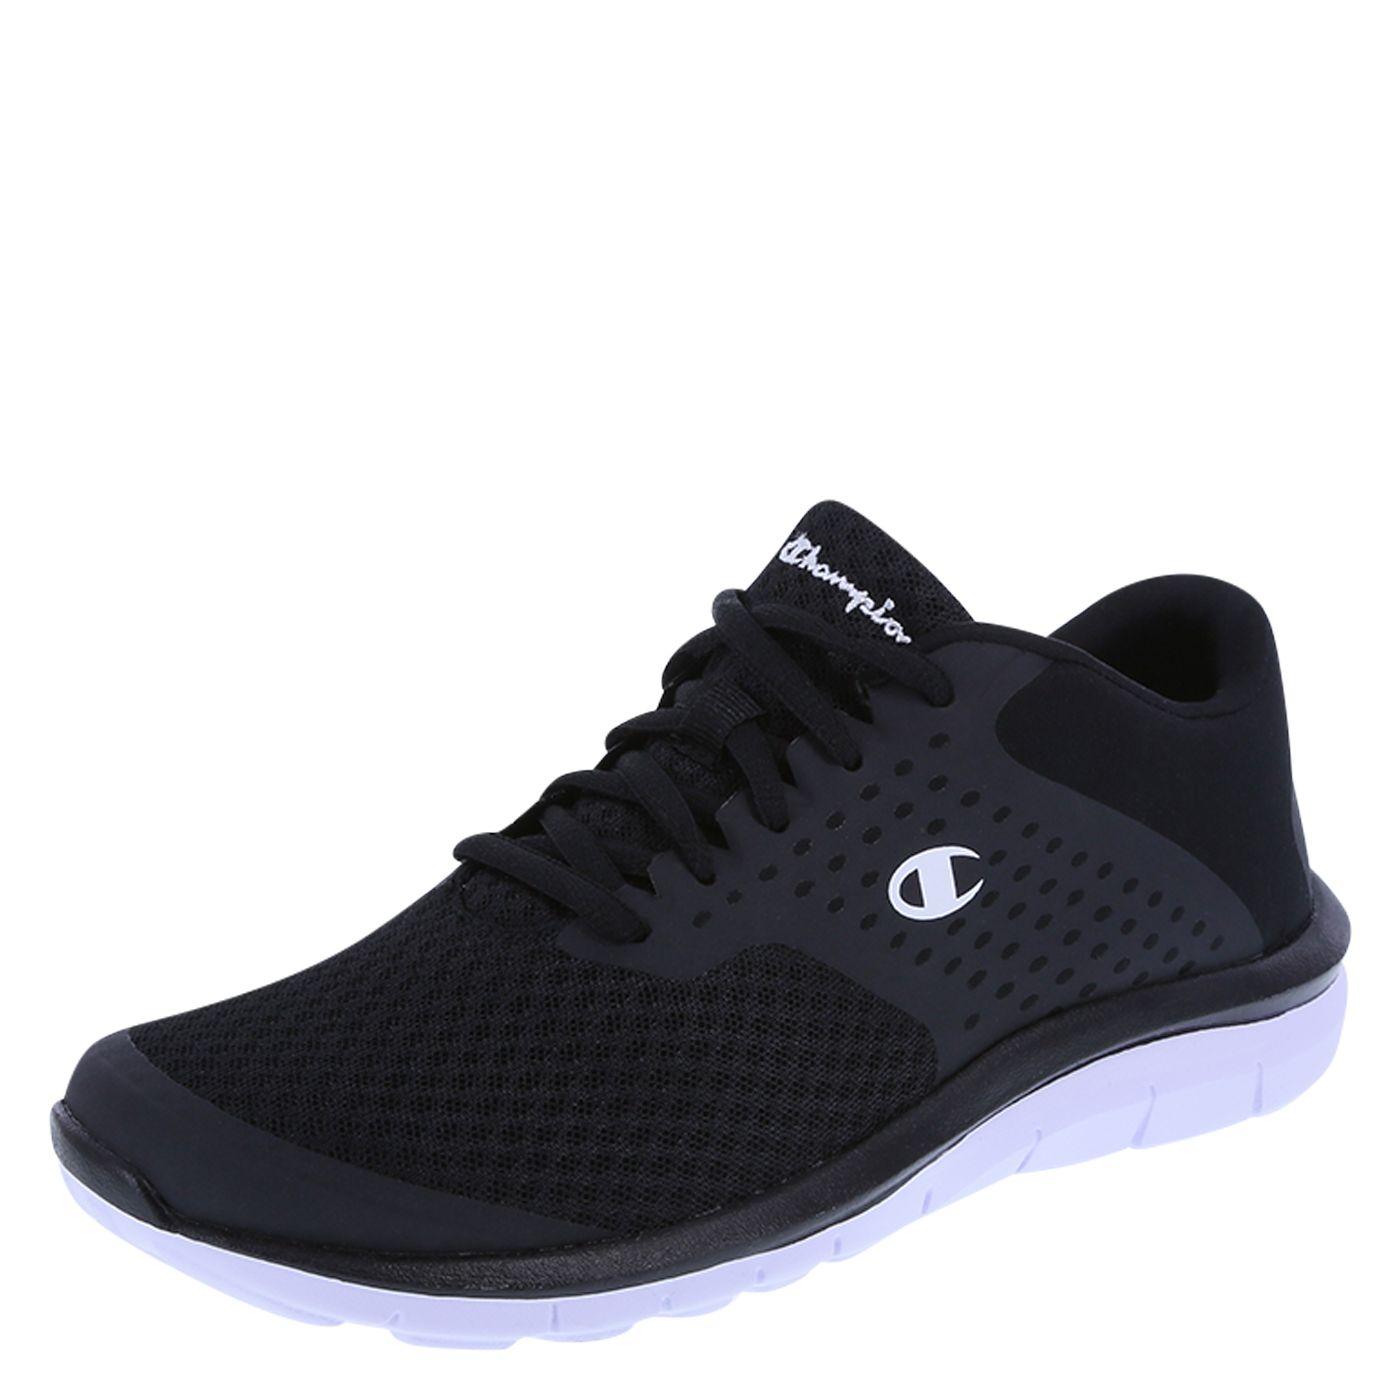 4b49764b9d4176 Women s Gusto Cross Trainer (Black   White). Champion Gusto Women s Trainer  Shoe